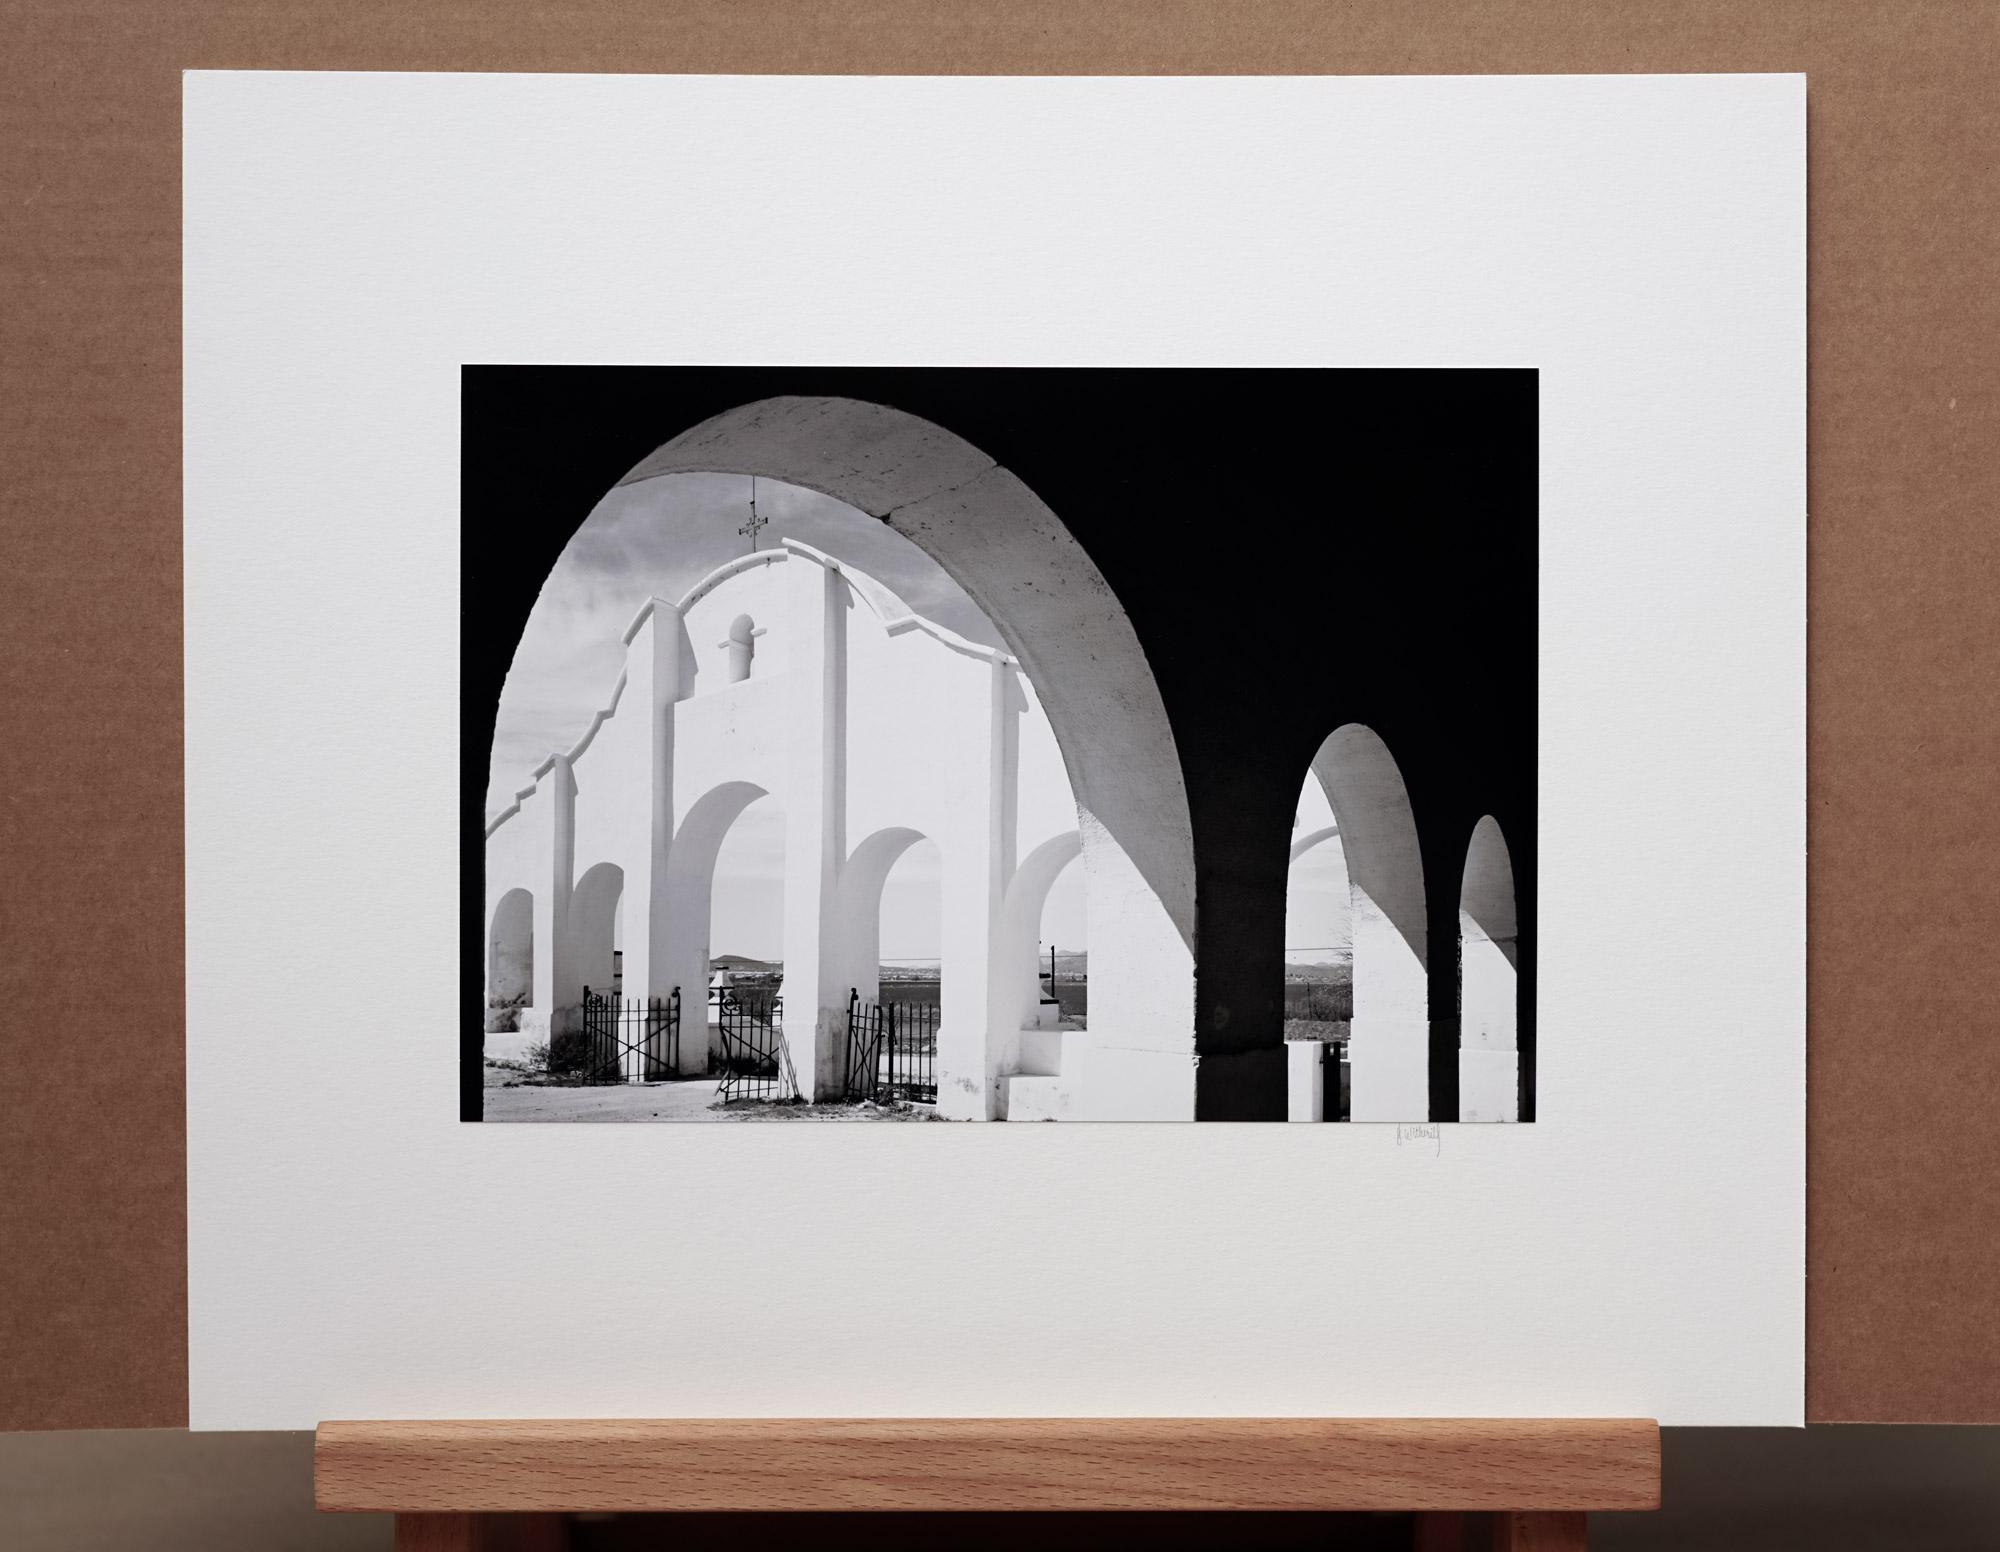 Mission San Xavier del Bac, AZ, 1981 - 8x10